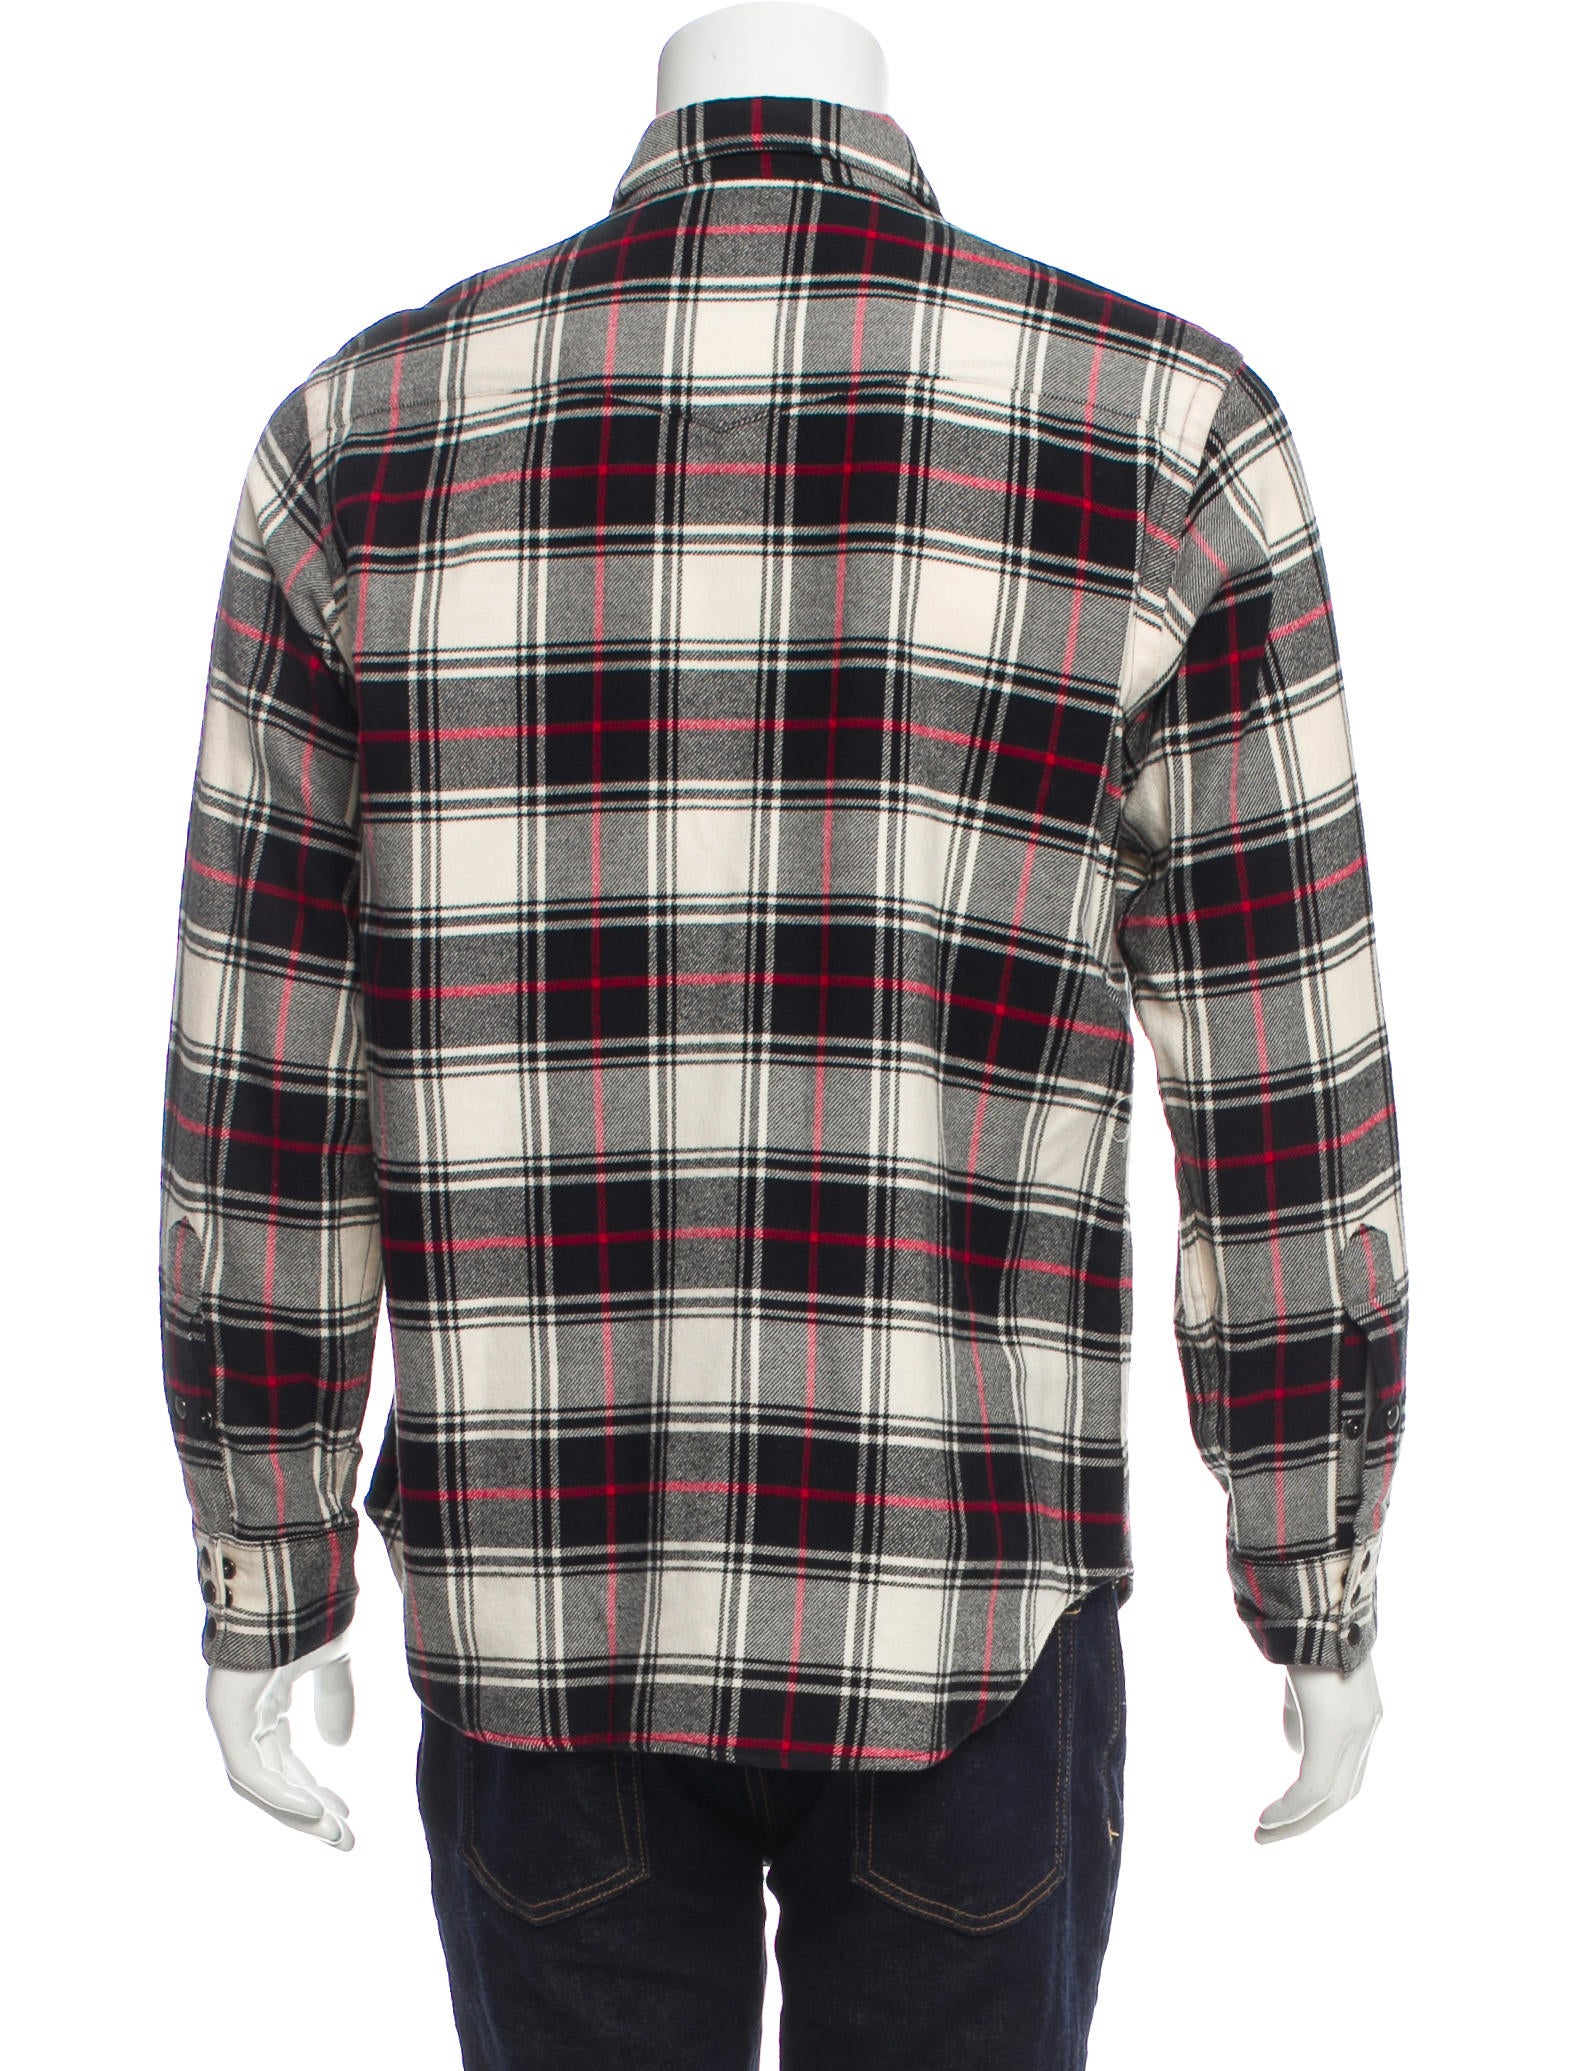 Polo Ralph Lauren Plaid Button-Up Shirt - Clothing ...